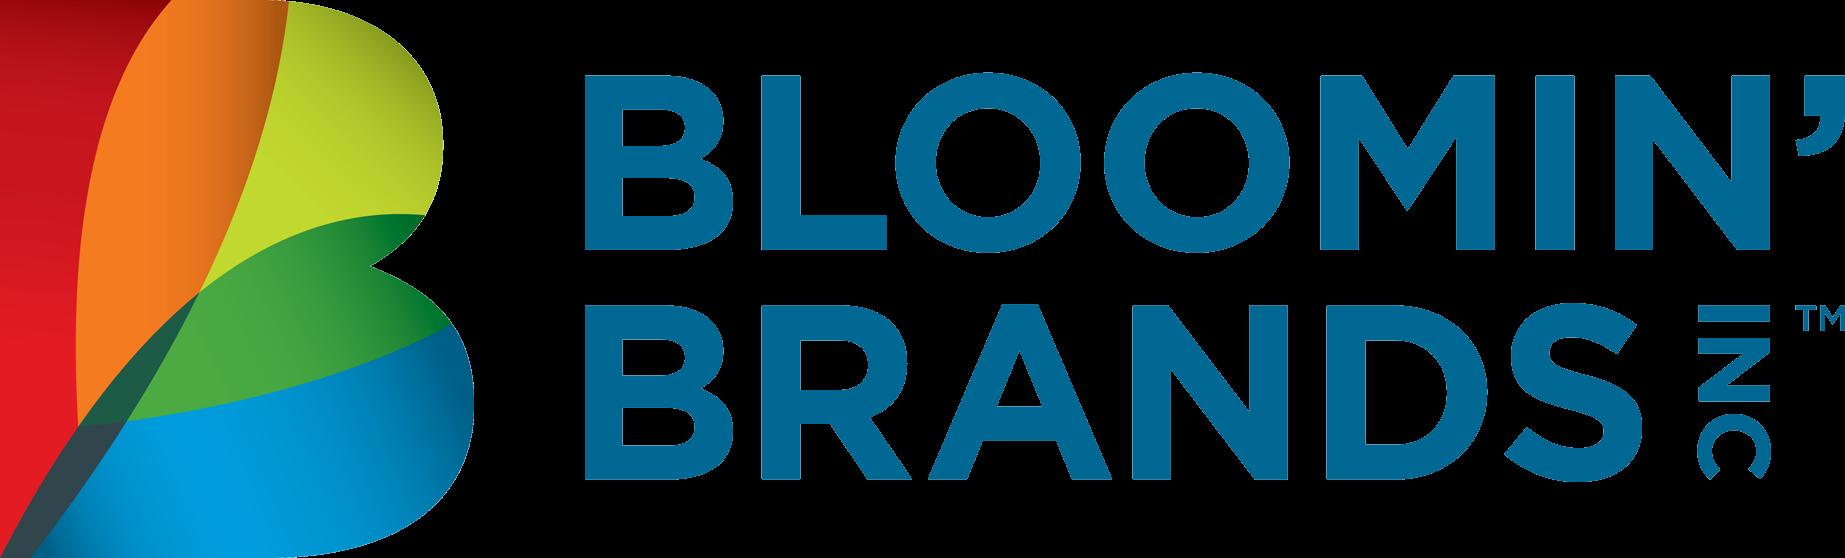 Bloomin' Brands - Restauarant Supply Chain Case Study